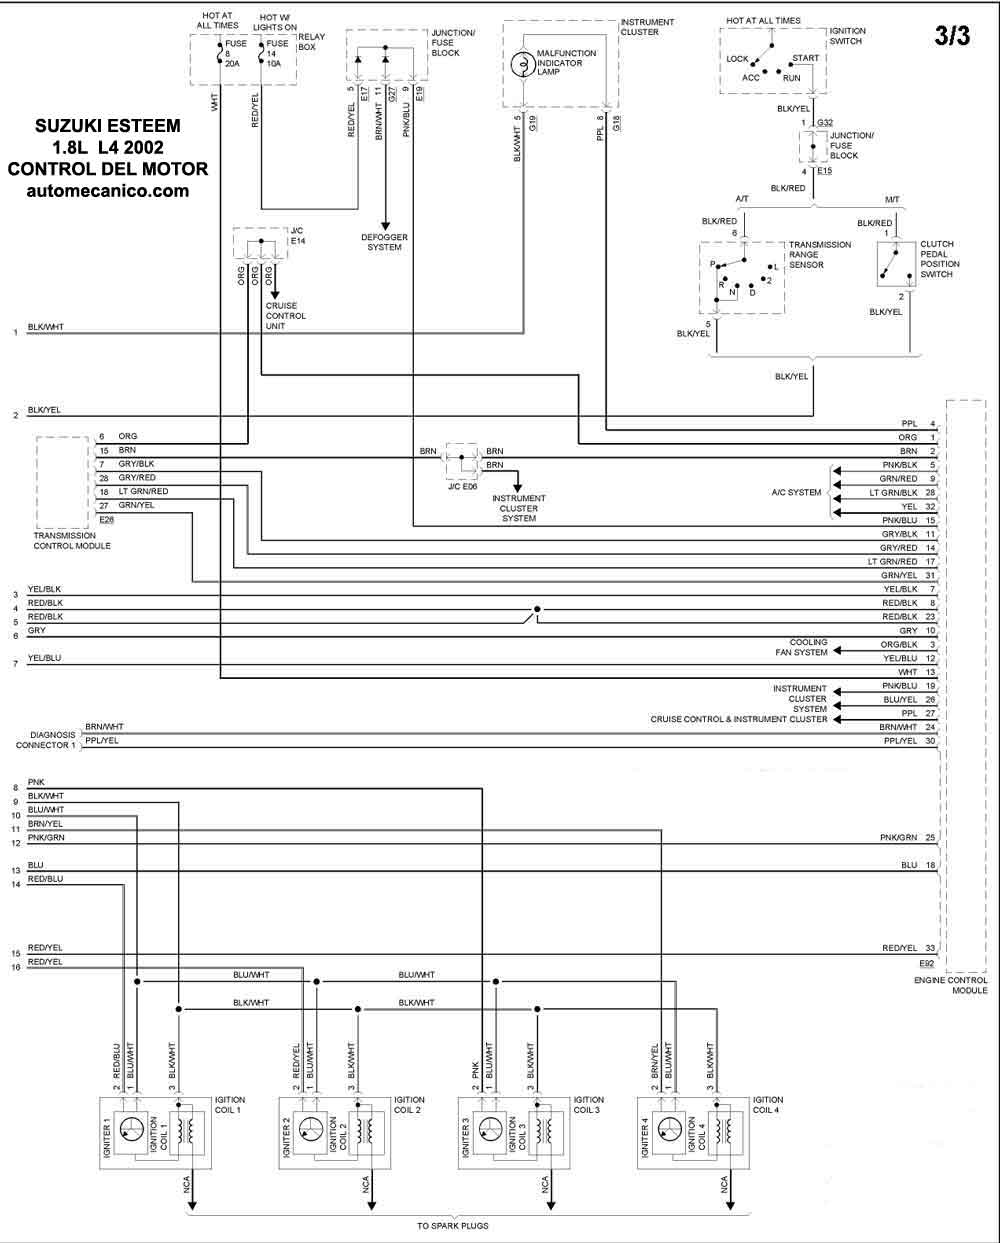 Diagram Suzuki Esteem Motor Diagrama Full Version Hd Quality Motor Diagrama Diagramsheap Unbroken Ilfilm It